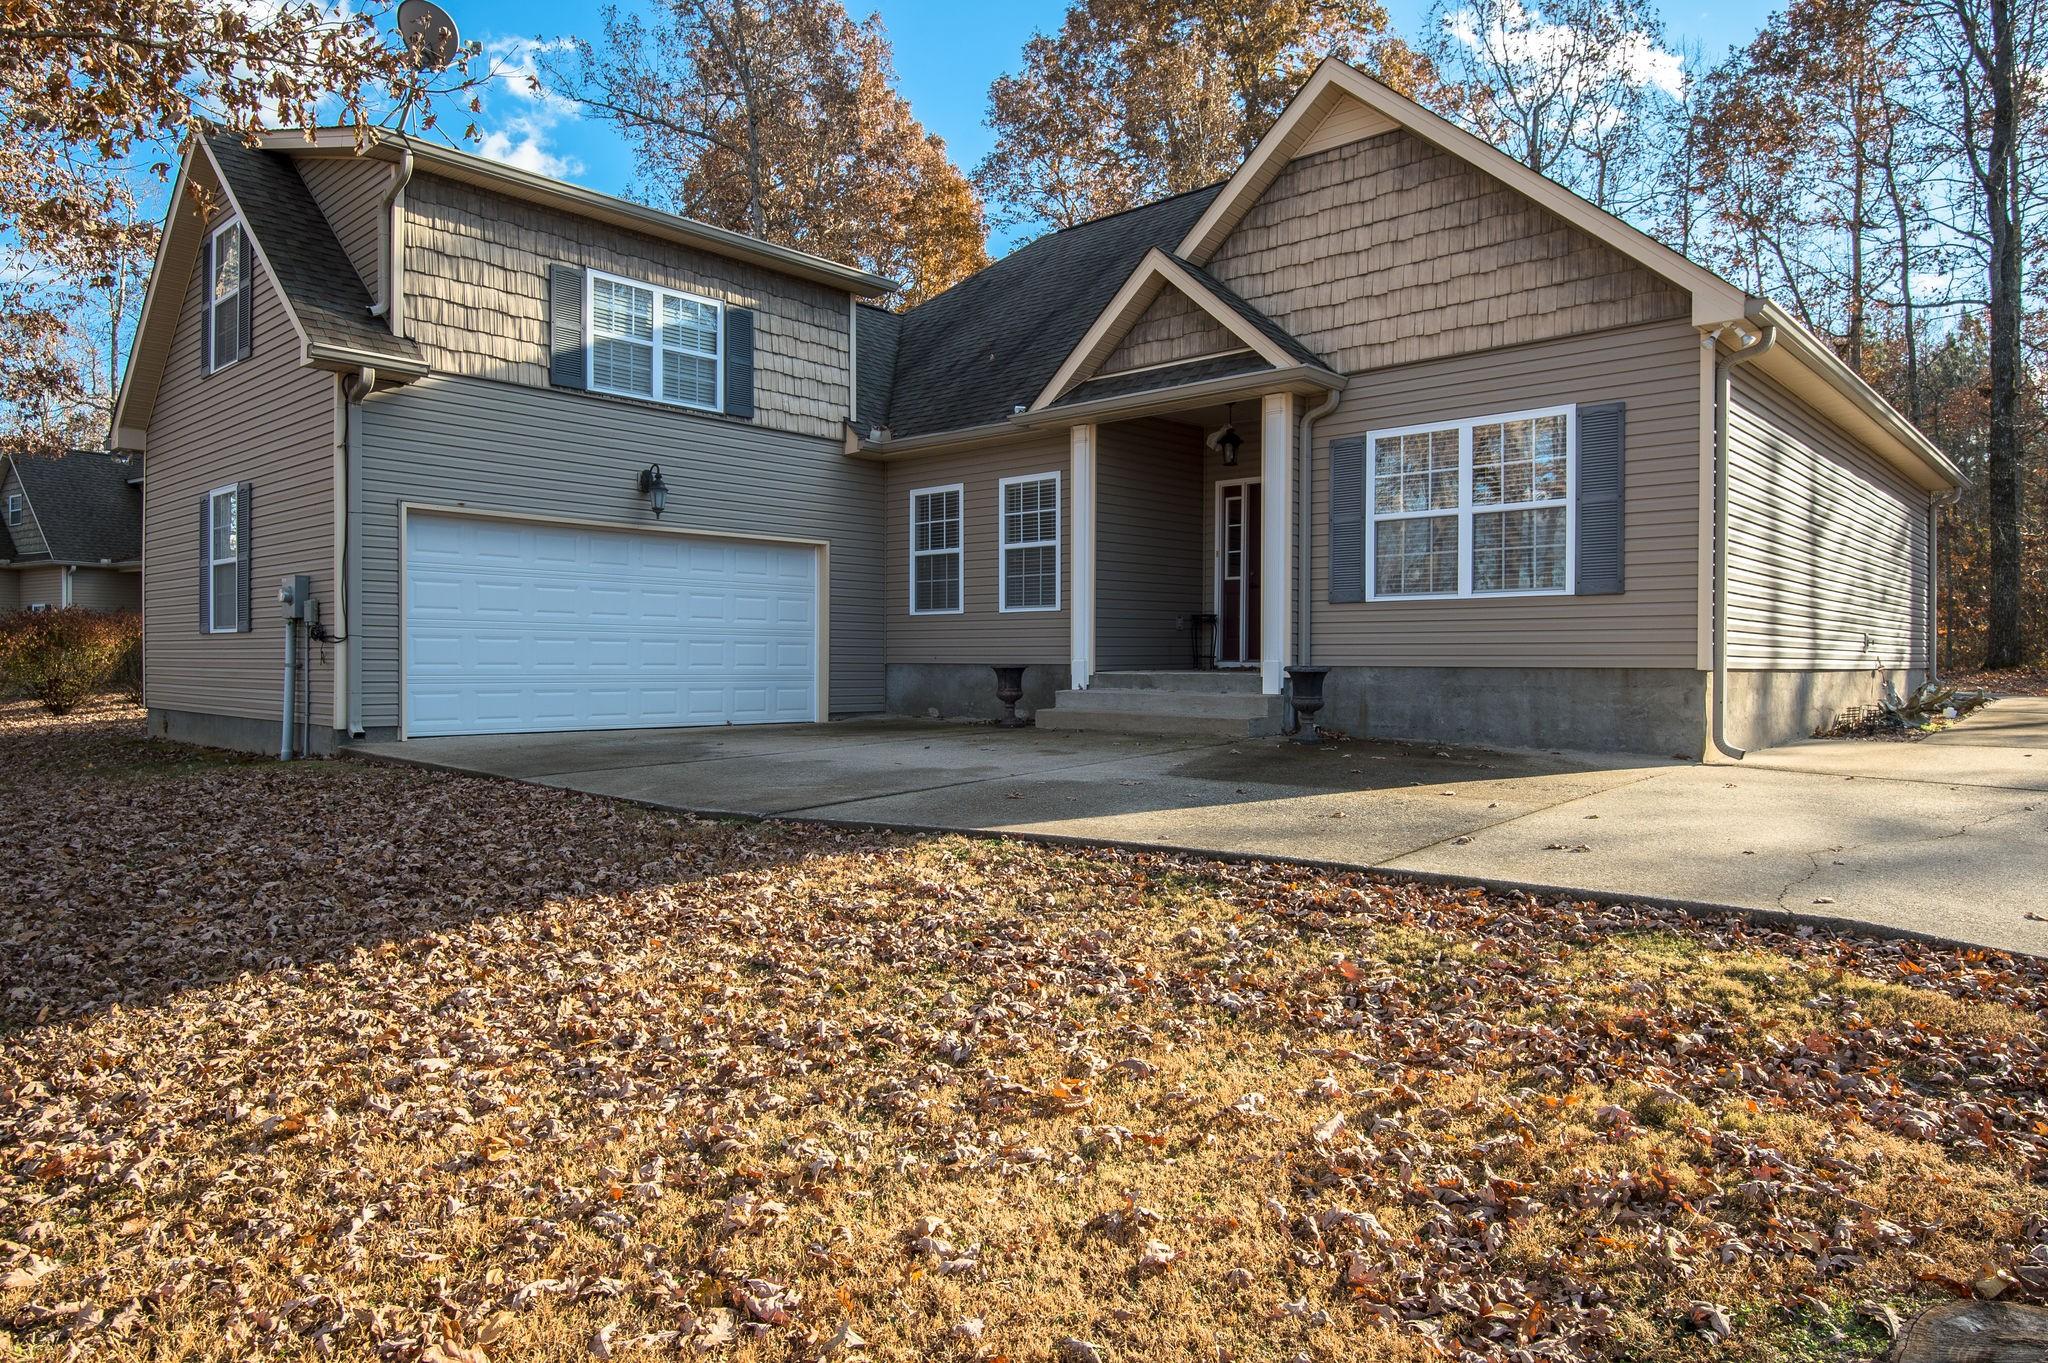 1220 Turnbull Rd, White Bluff, TN 37187 - White Bluff, TN real estate listing